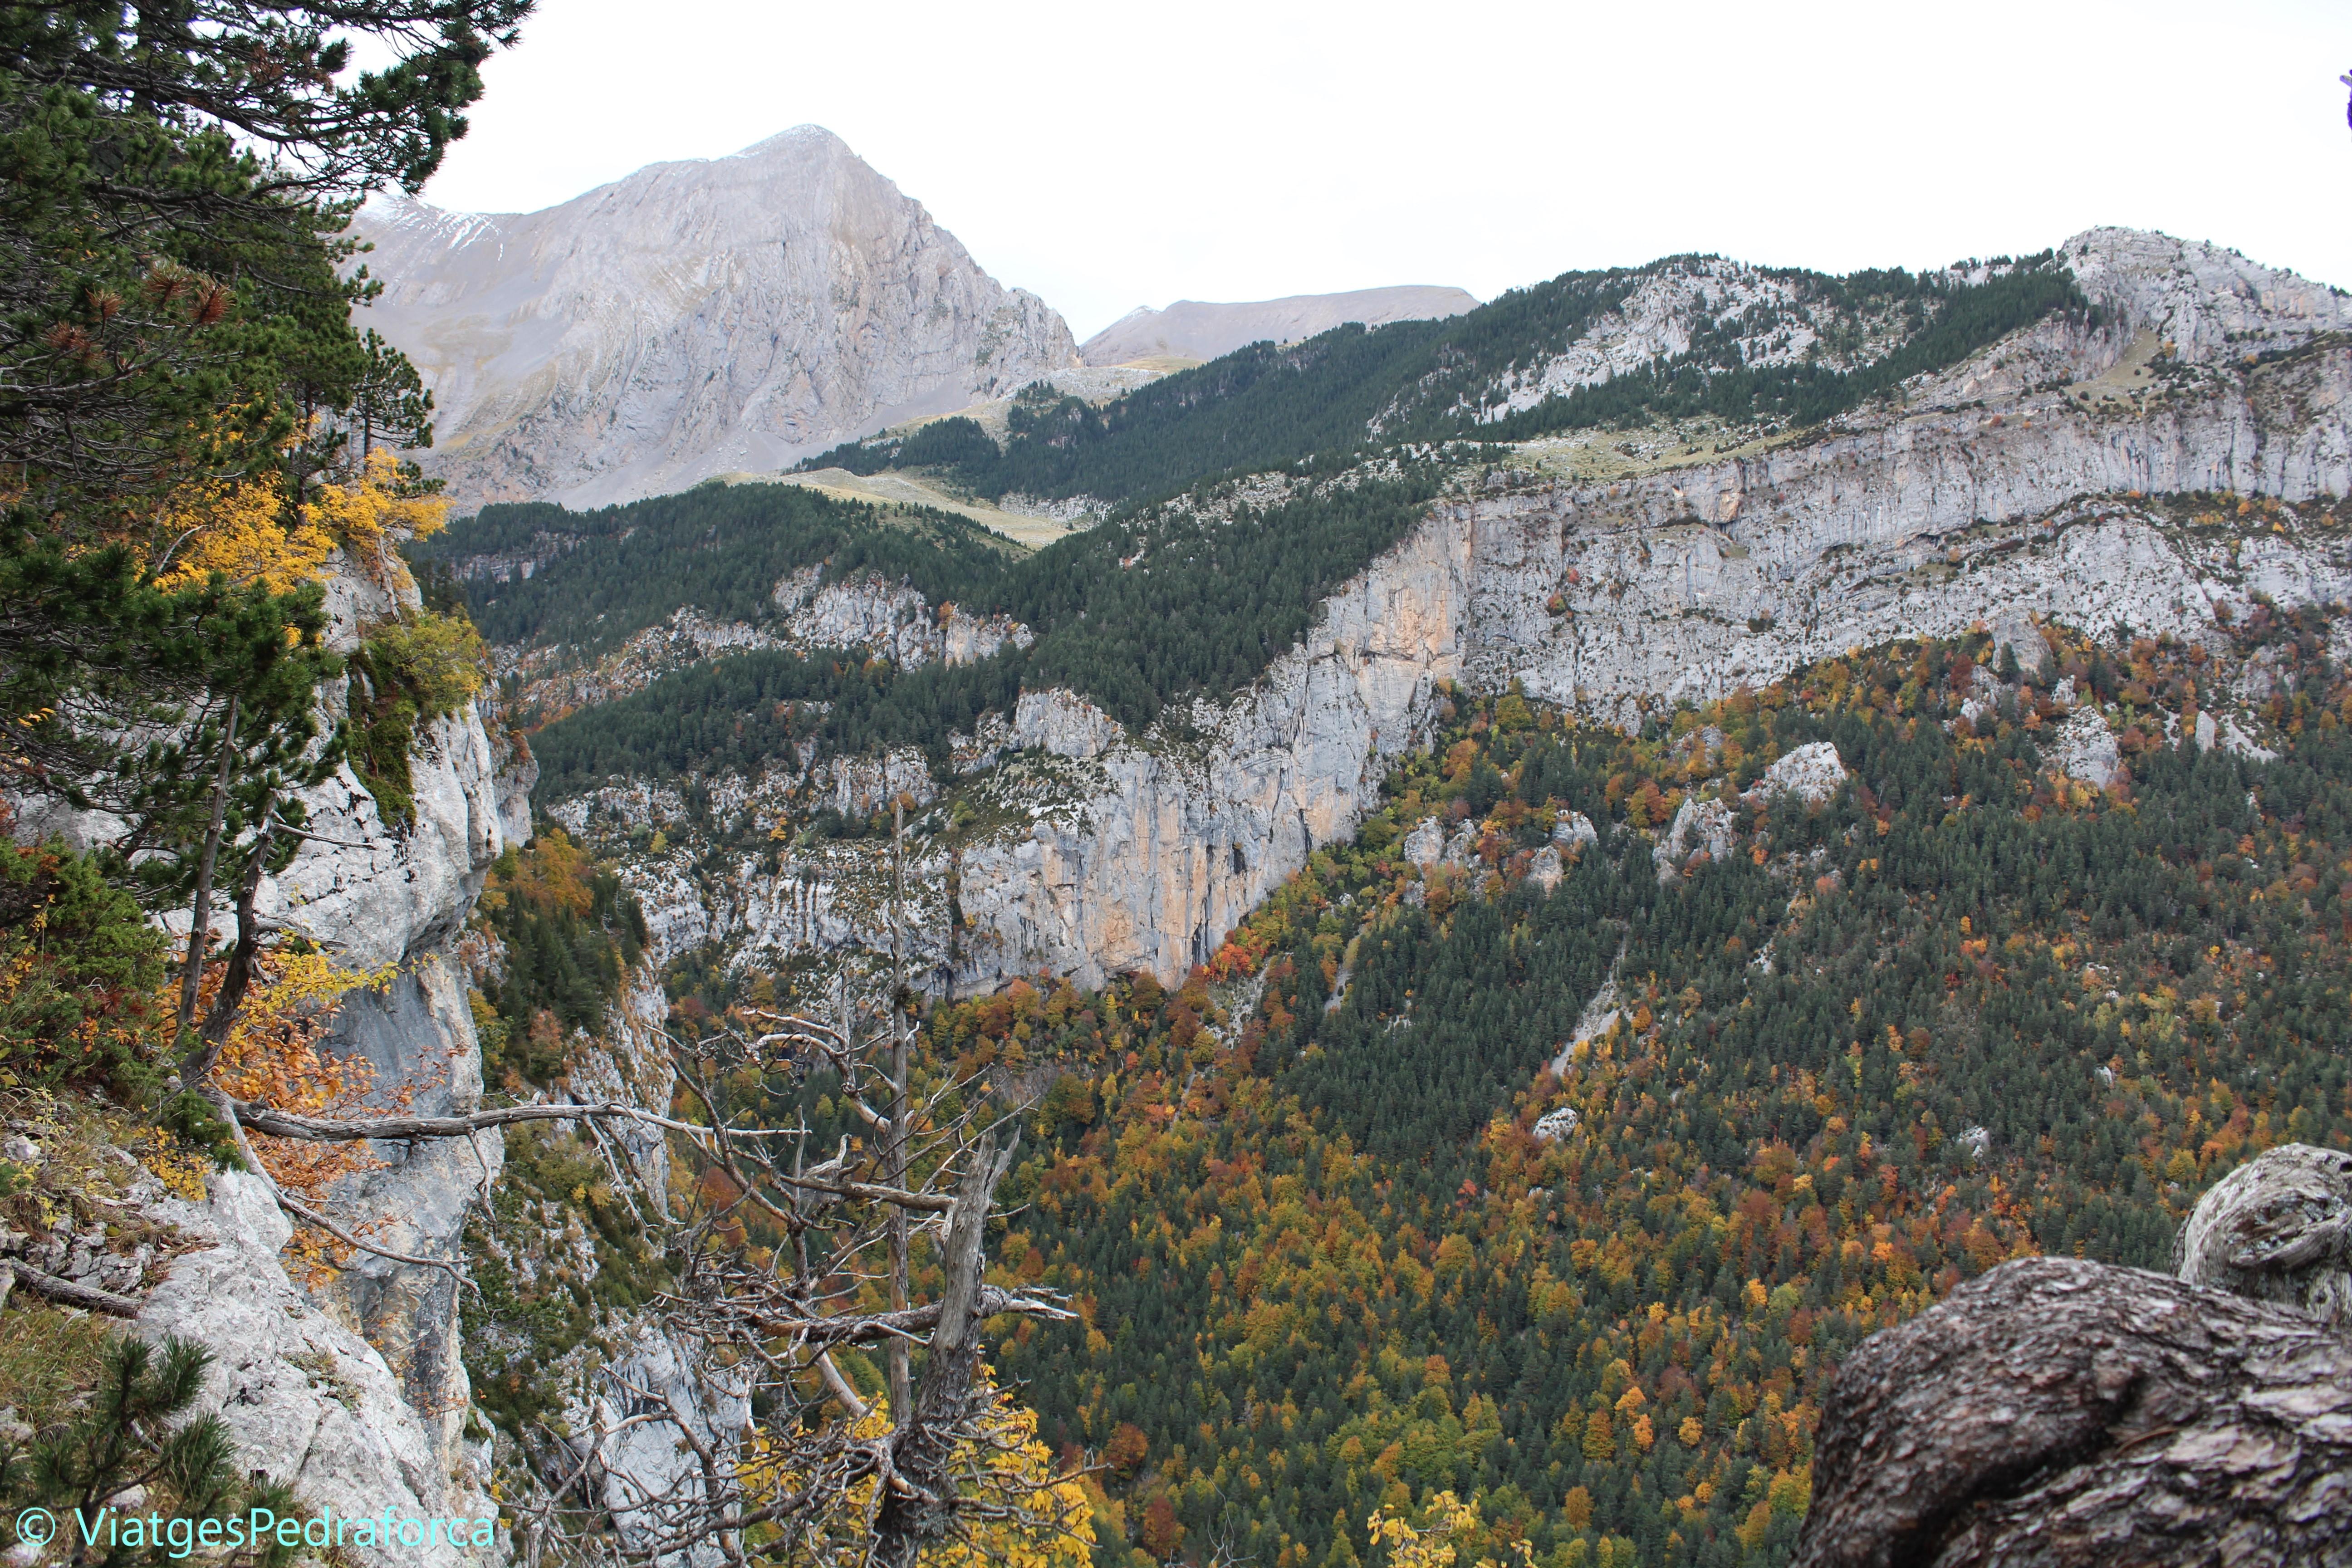 Circo de Armeña, Cotiella, Pirineus, Aragó, Osca, senderisme, ruta senderista, fotografia de atura